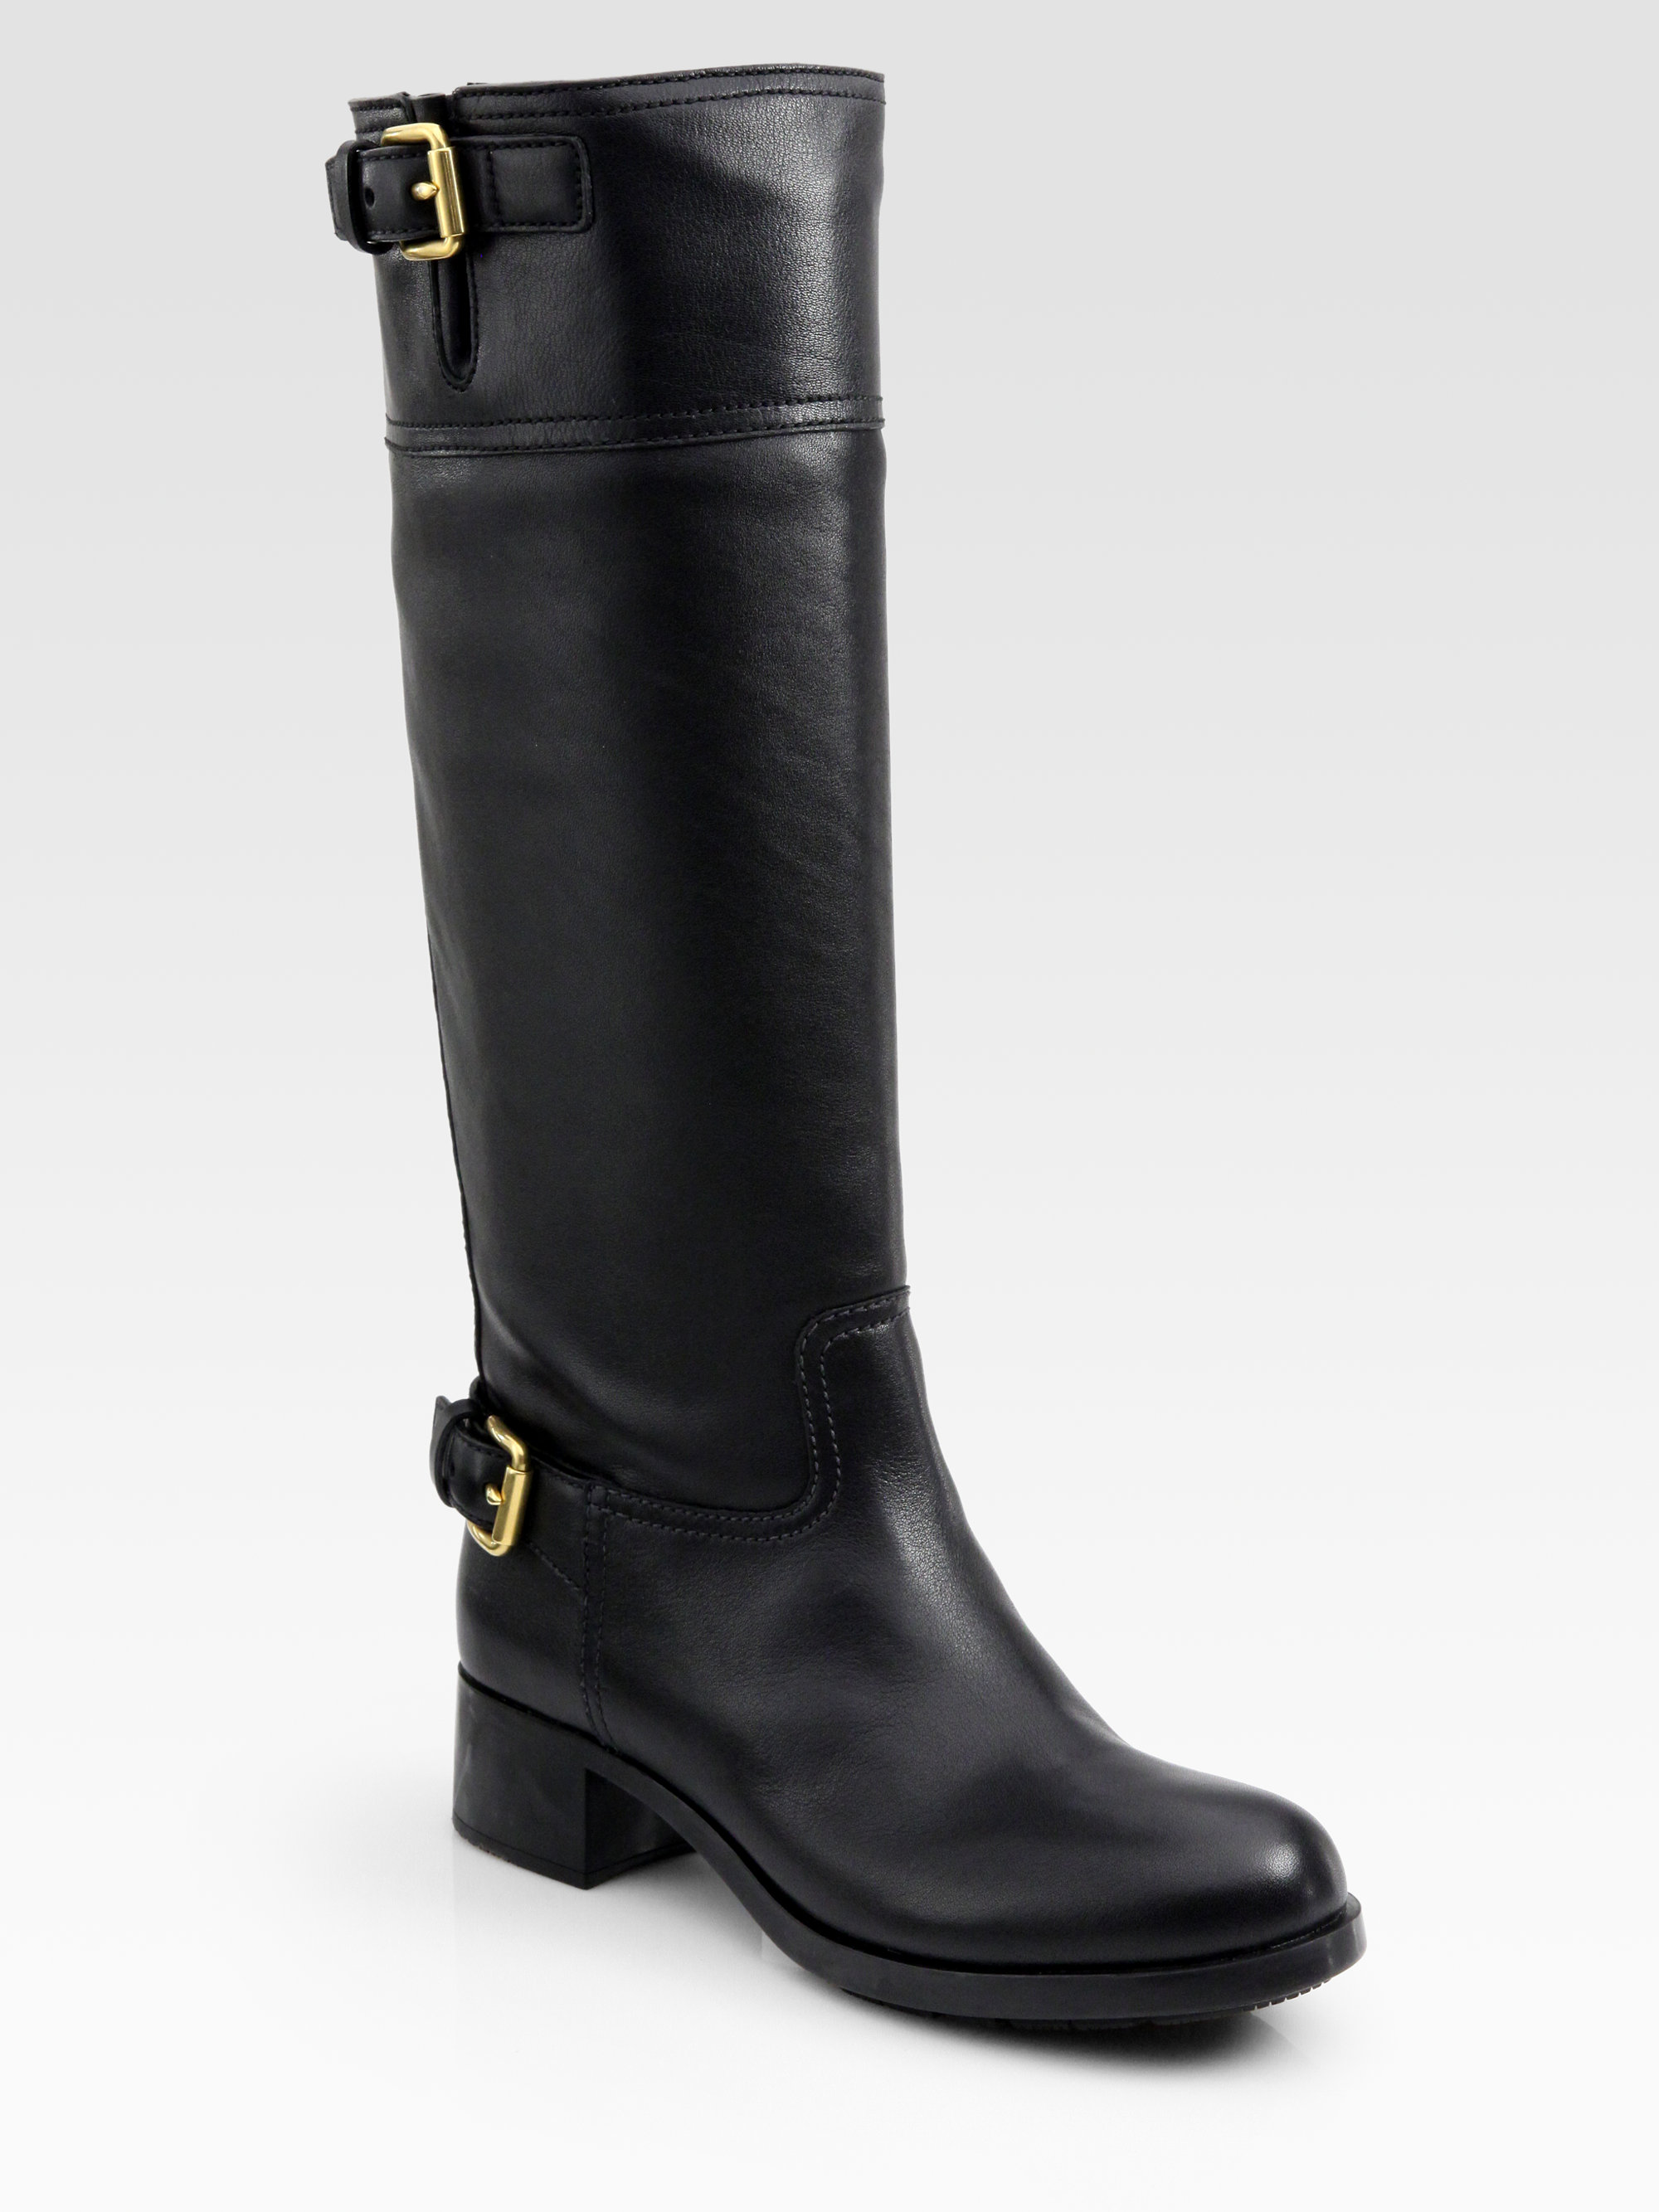 Prada Lug Sole Motorcycle Boots In Black Lyst